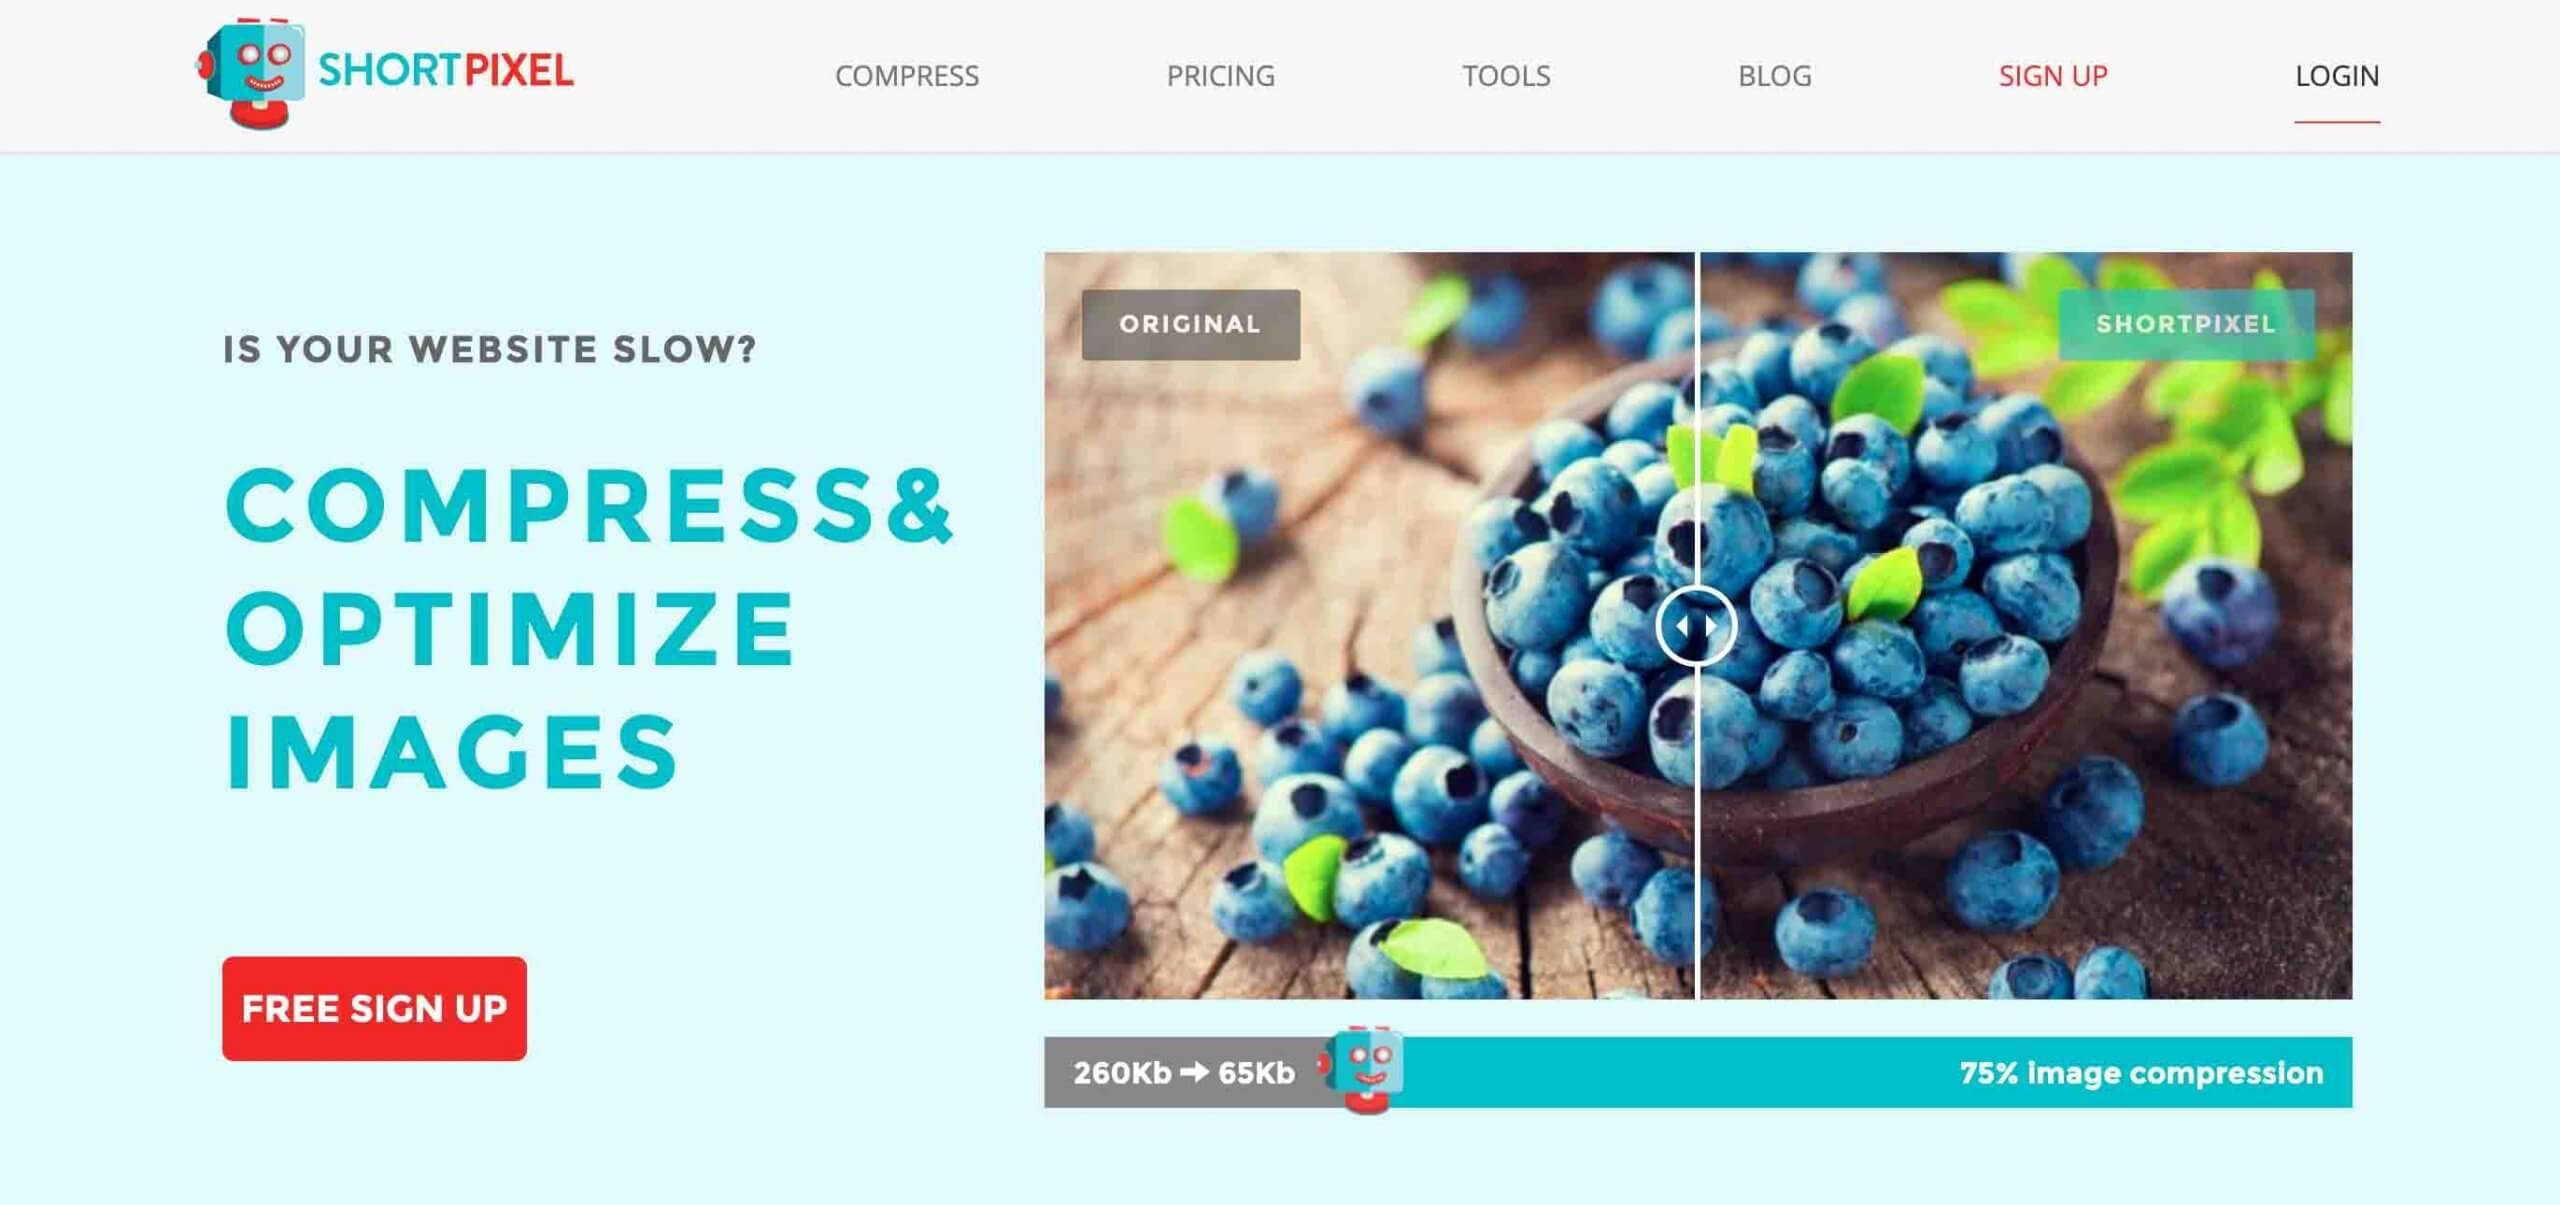 ShortPixel - WordPress Plugin for eCommerce